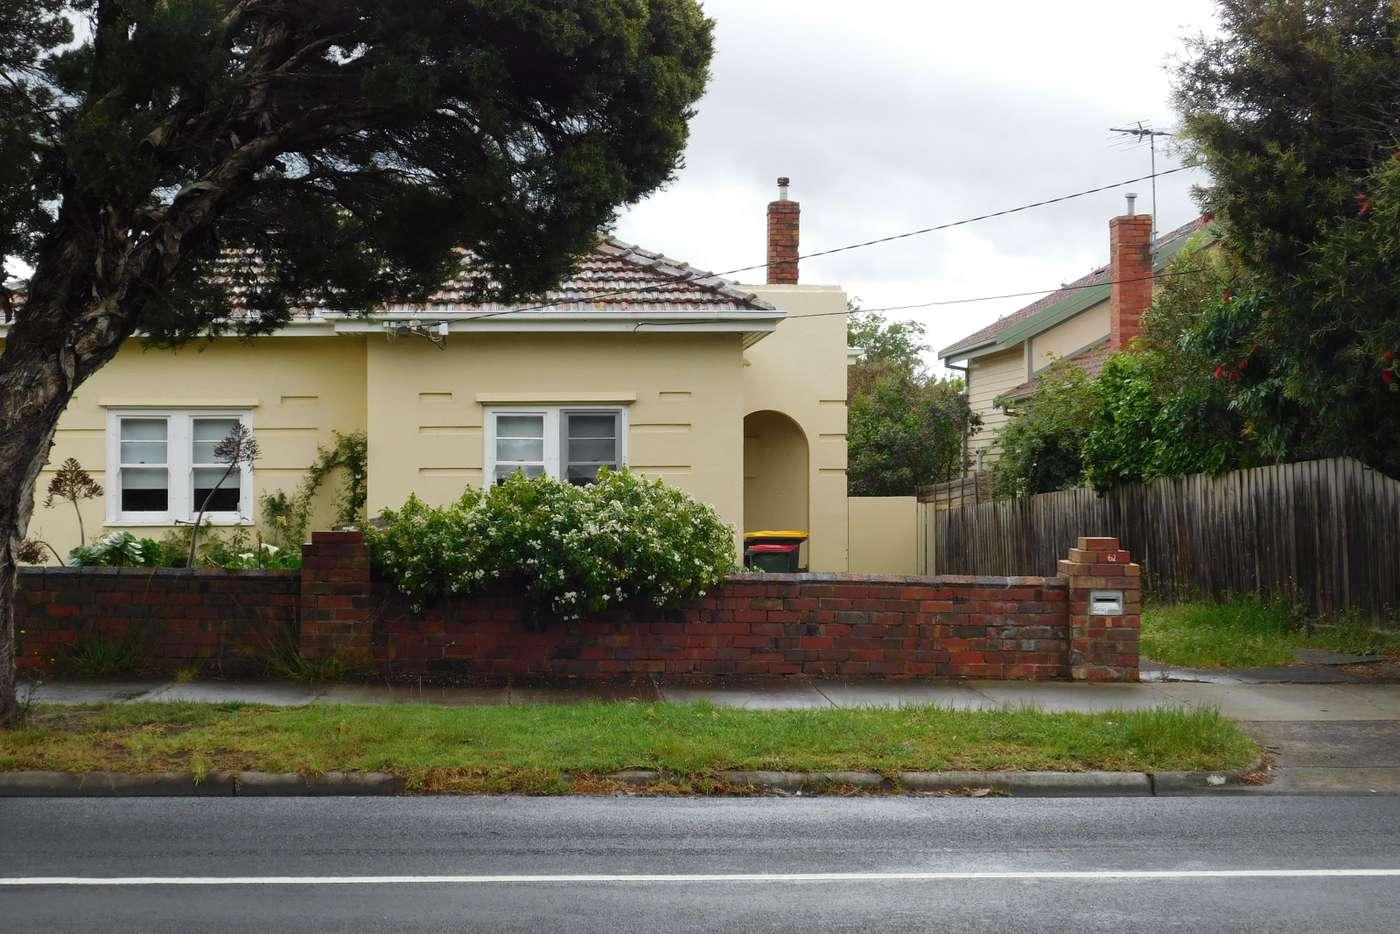 Main view of Homely house listing, 62 Kangaroo Road, Murrumbeena VIC 3163